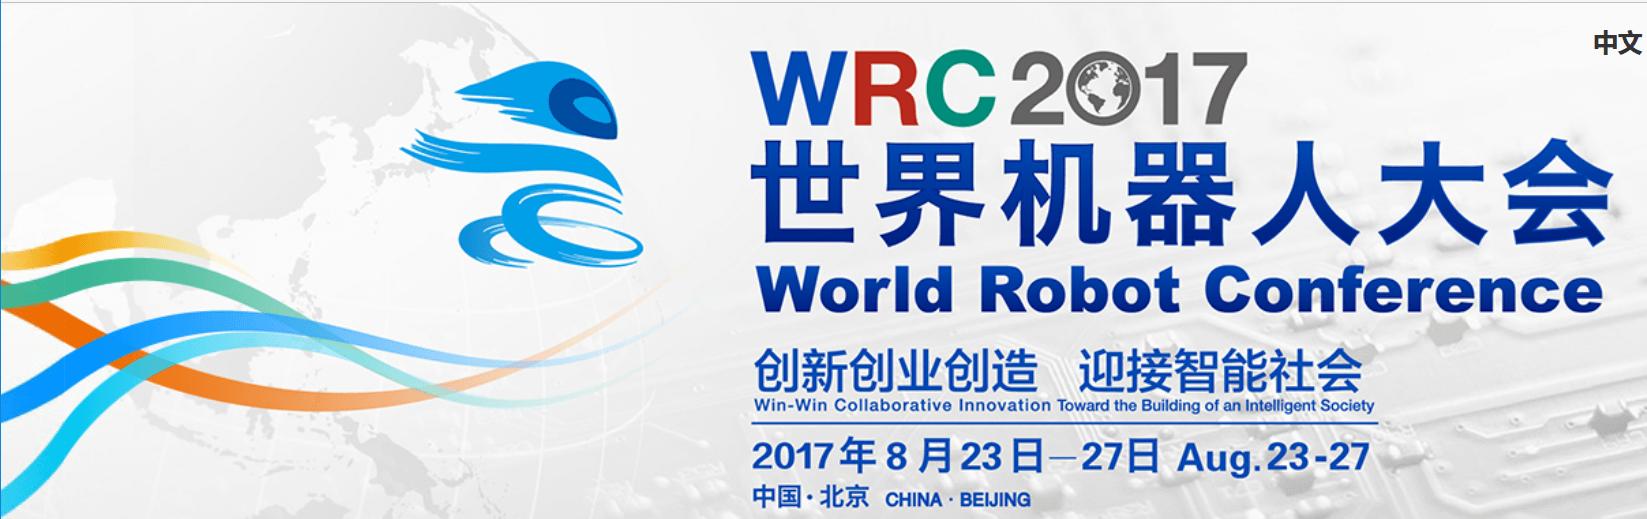 World Robot Confrence 2017 F P